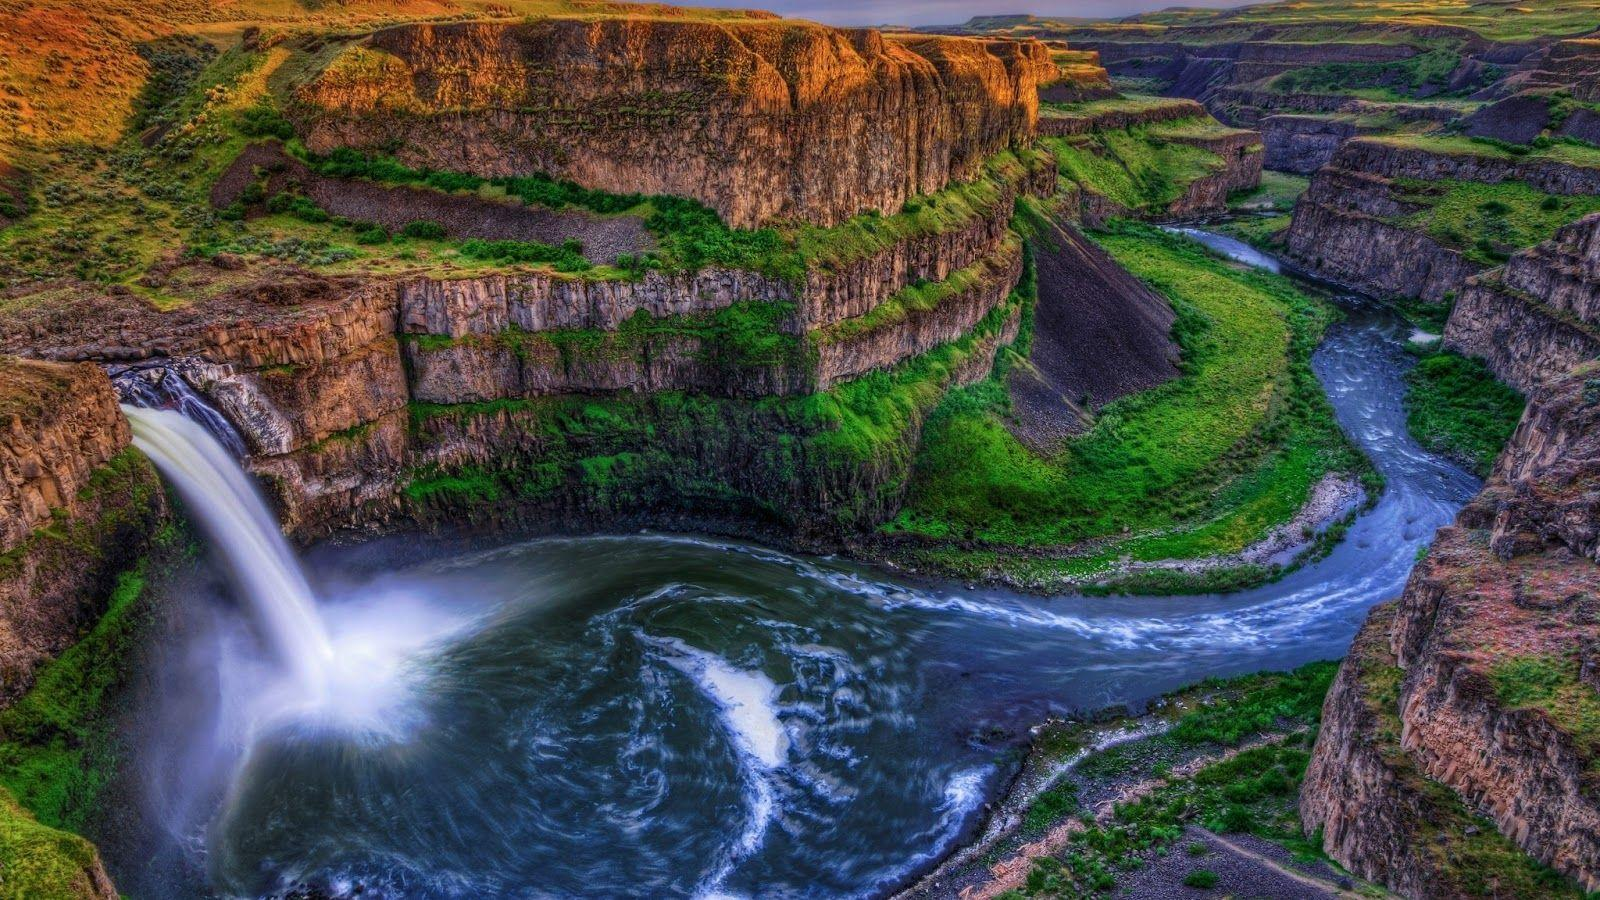 River Wallpaper 16009 1600x900 Px Hdwallsource